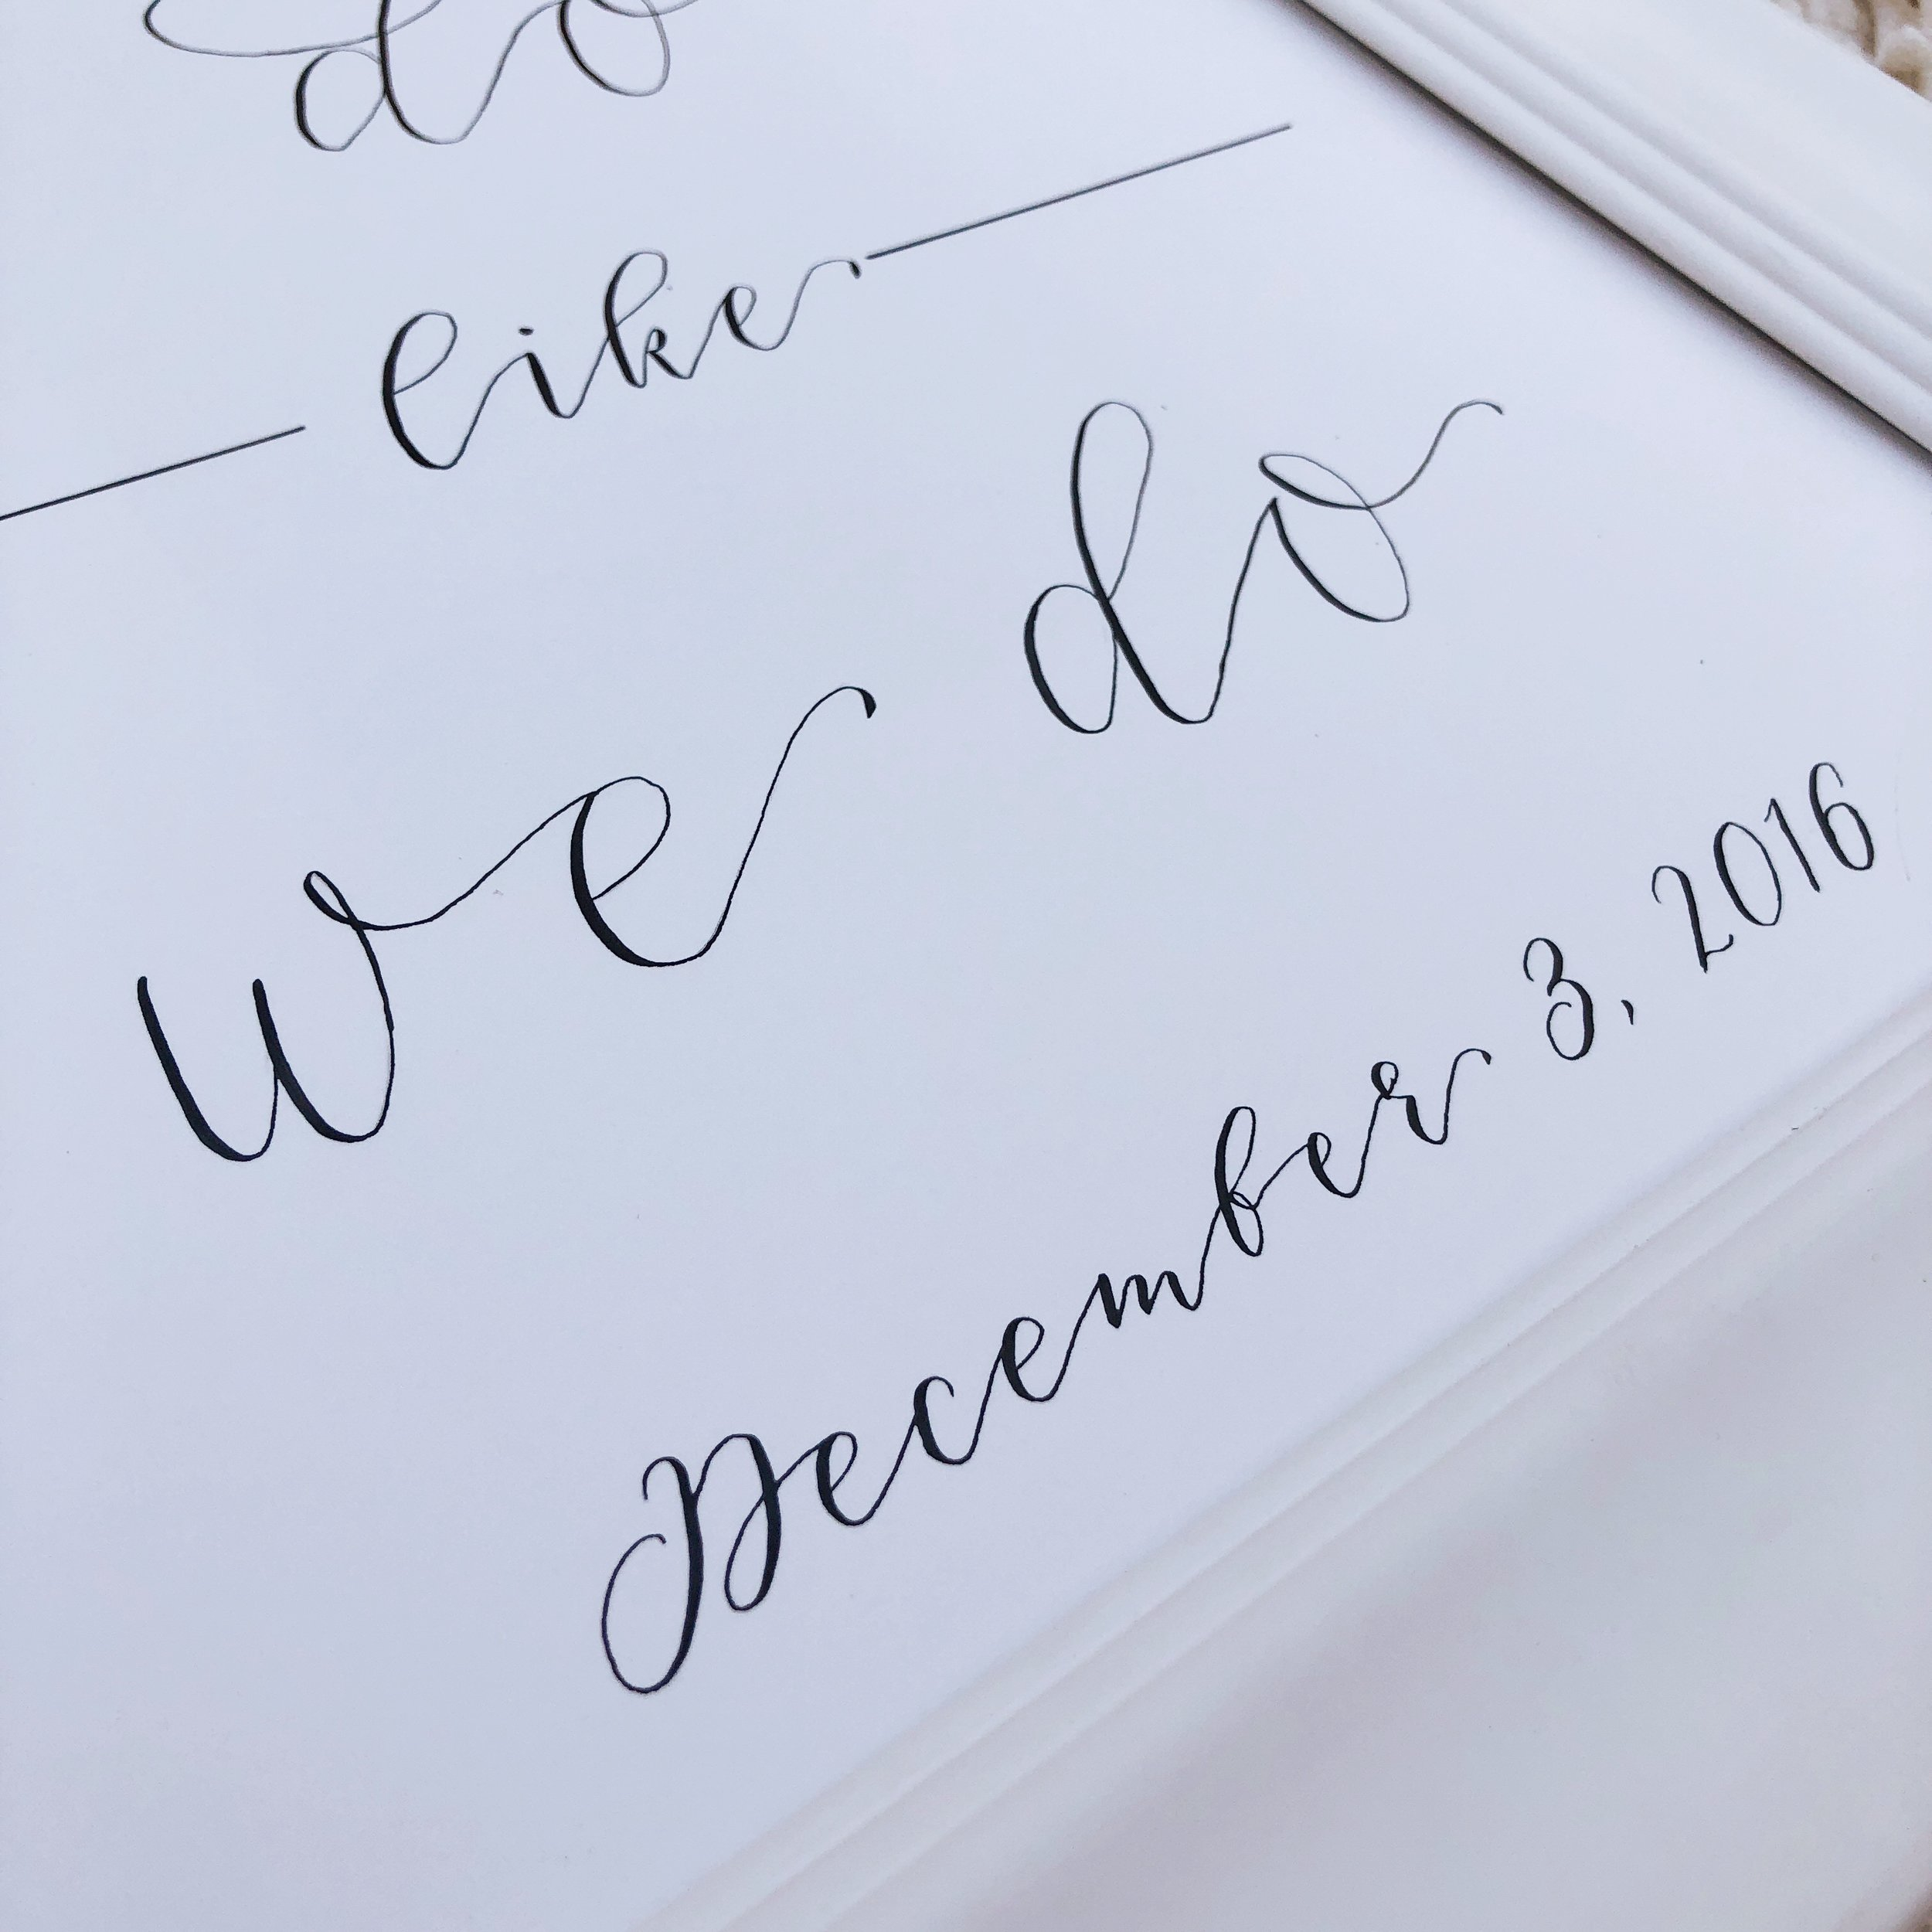 Central PA, York PA, JesSmith Designs, custom, wedding, invitations, bridal, announcements, save the date, baby, hanover, calligraphy, baltimore, wedding invitations, lancaster, gettysburg-11-27 09.55.51.jpg